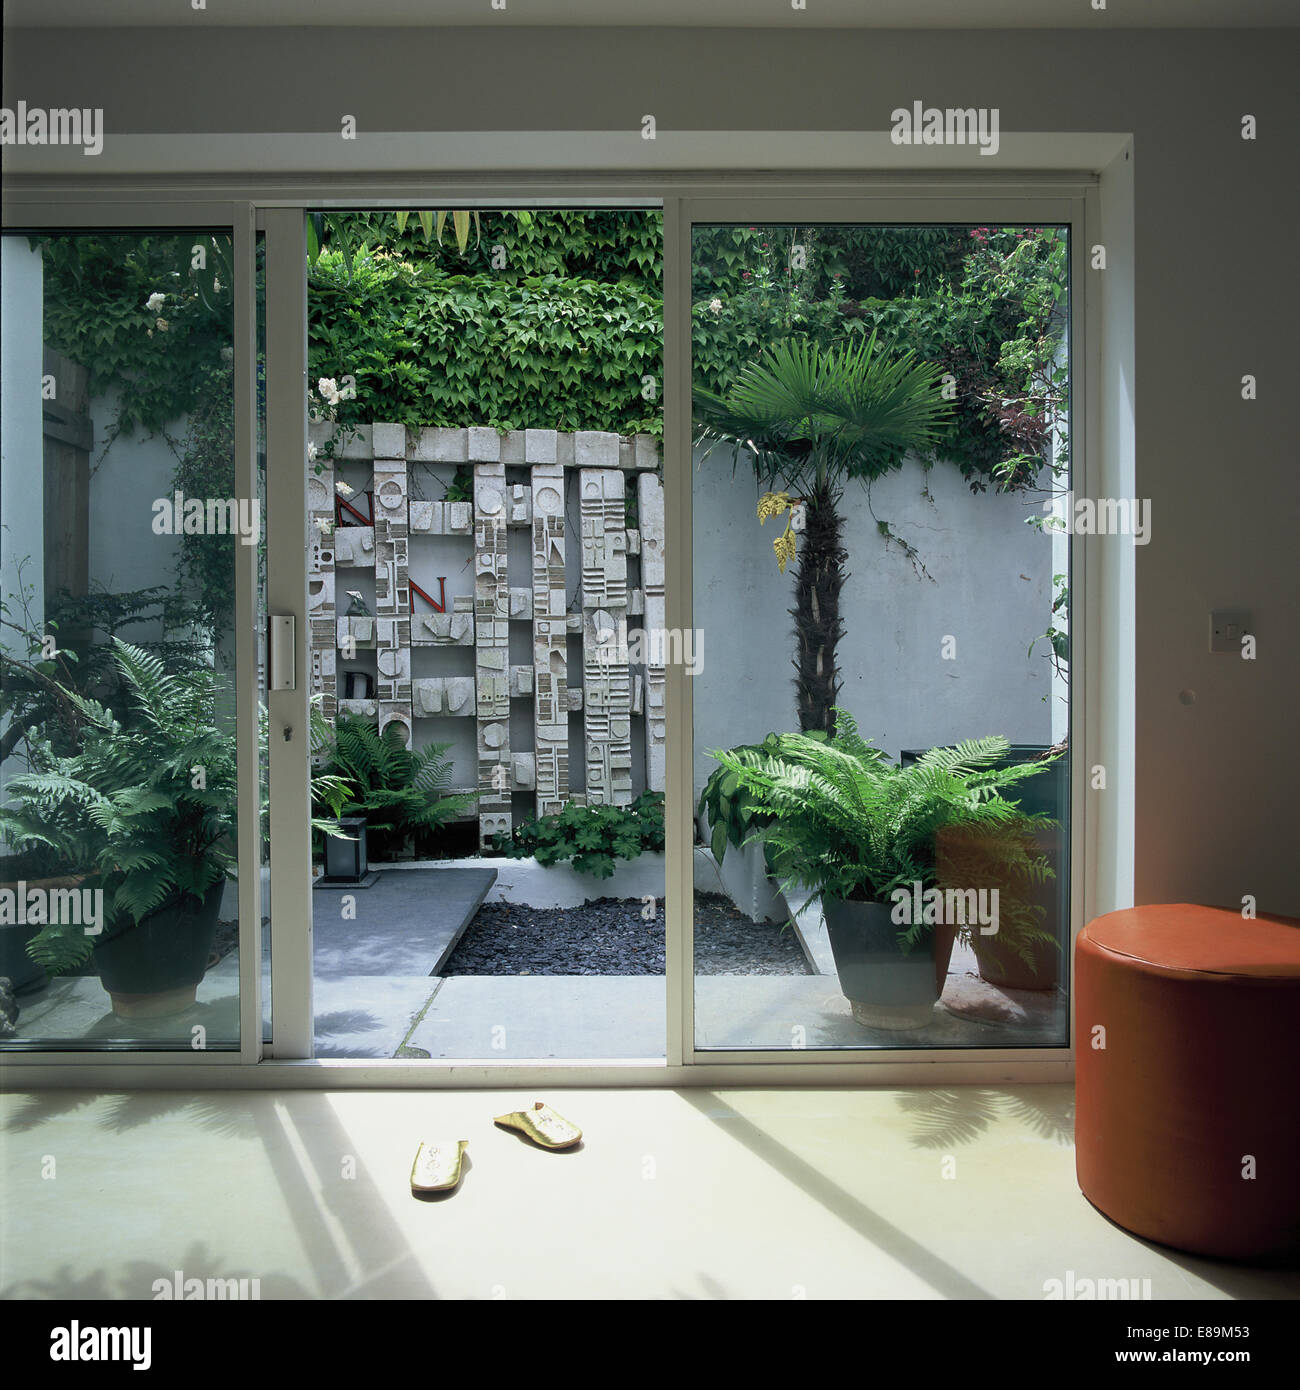 Stock photo view through glass patio doors to courtyard garden with wall sculpture